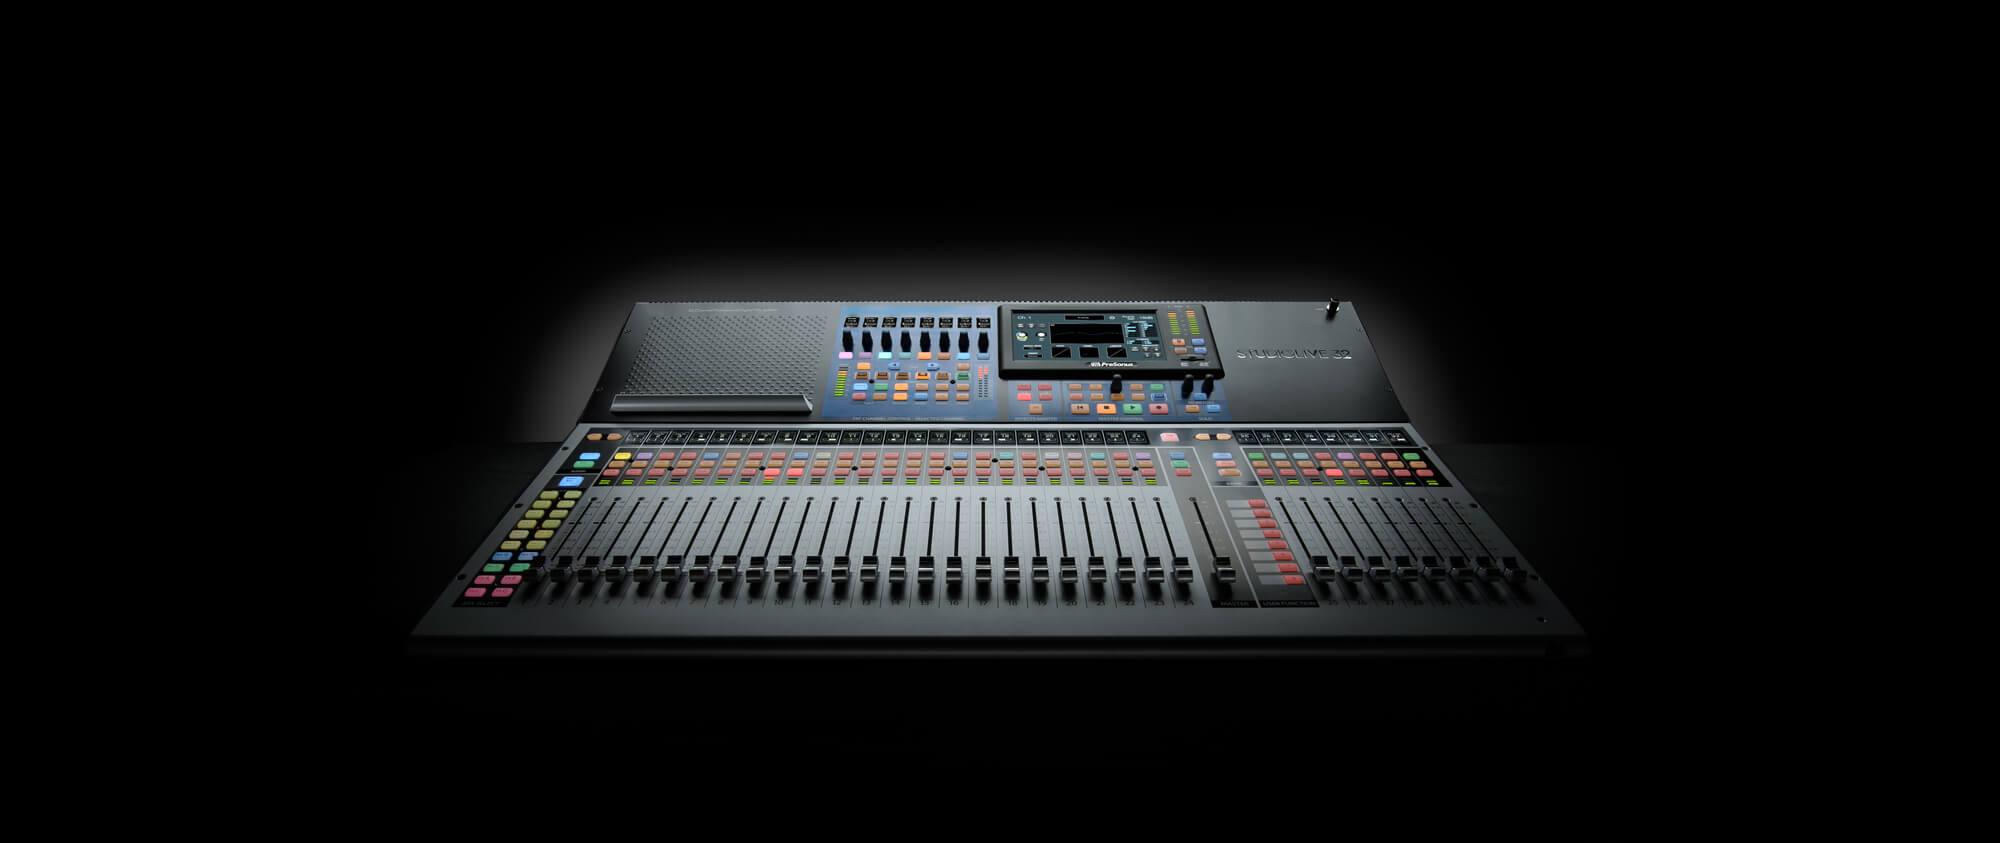 How To Record Sermon Audio For Your Website Or Podcast Faithengineer Studio Live Recording Setup 2010 The New Presonus Studiolive 32 Digital Console